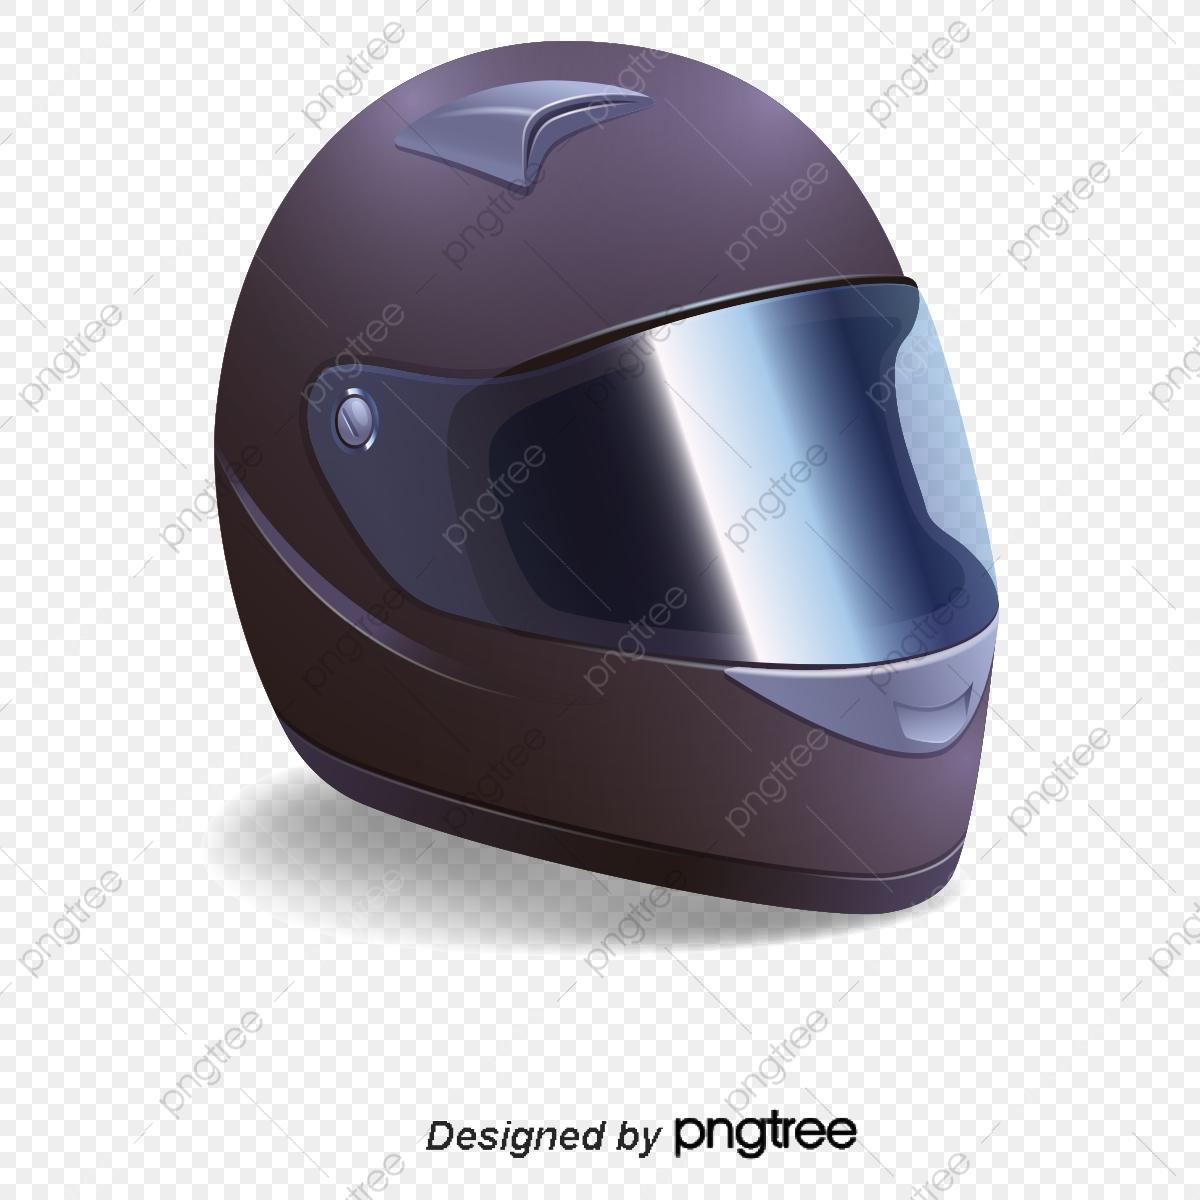 Helmet Vector, Helmet, Protective Equipment PNG and Vector with.